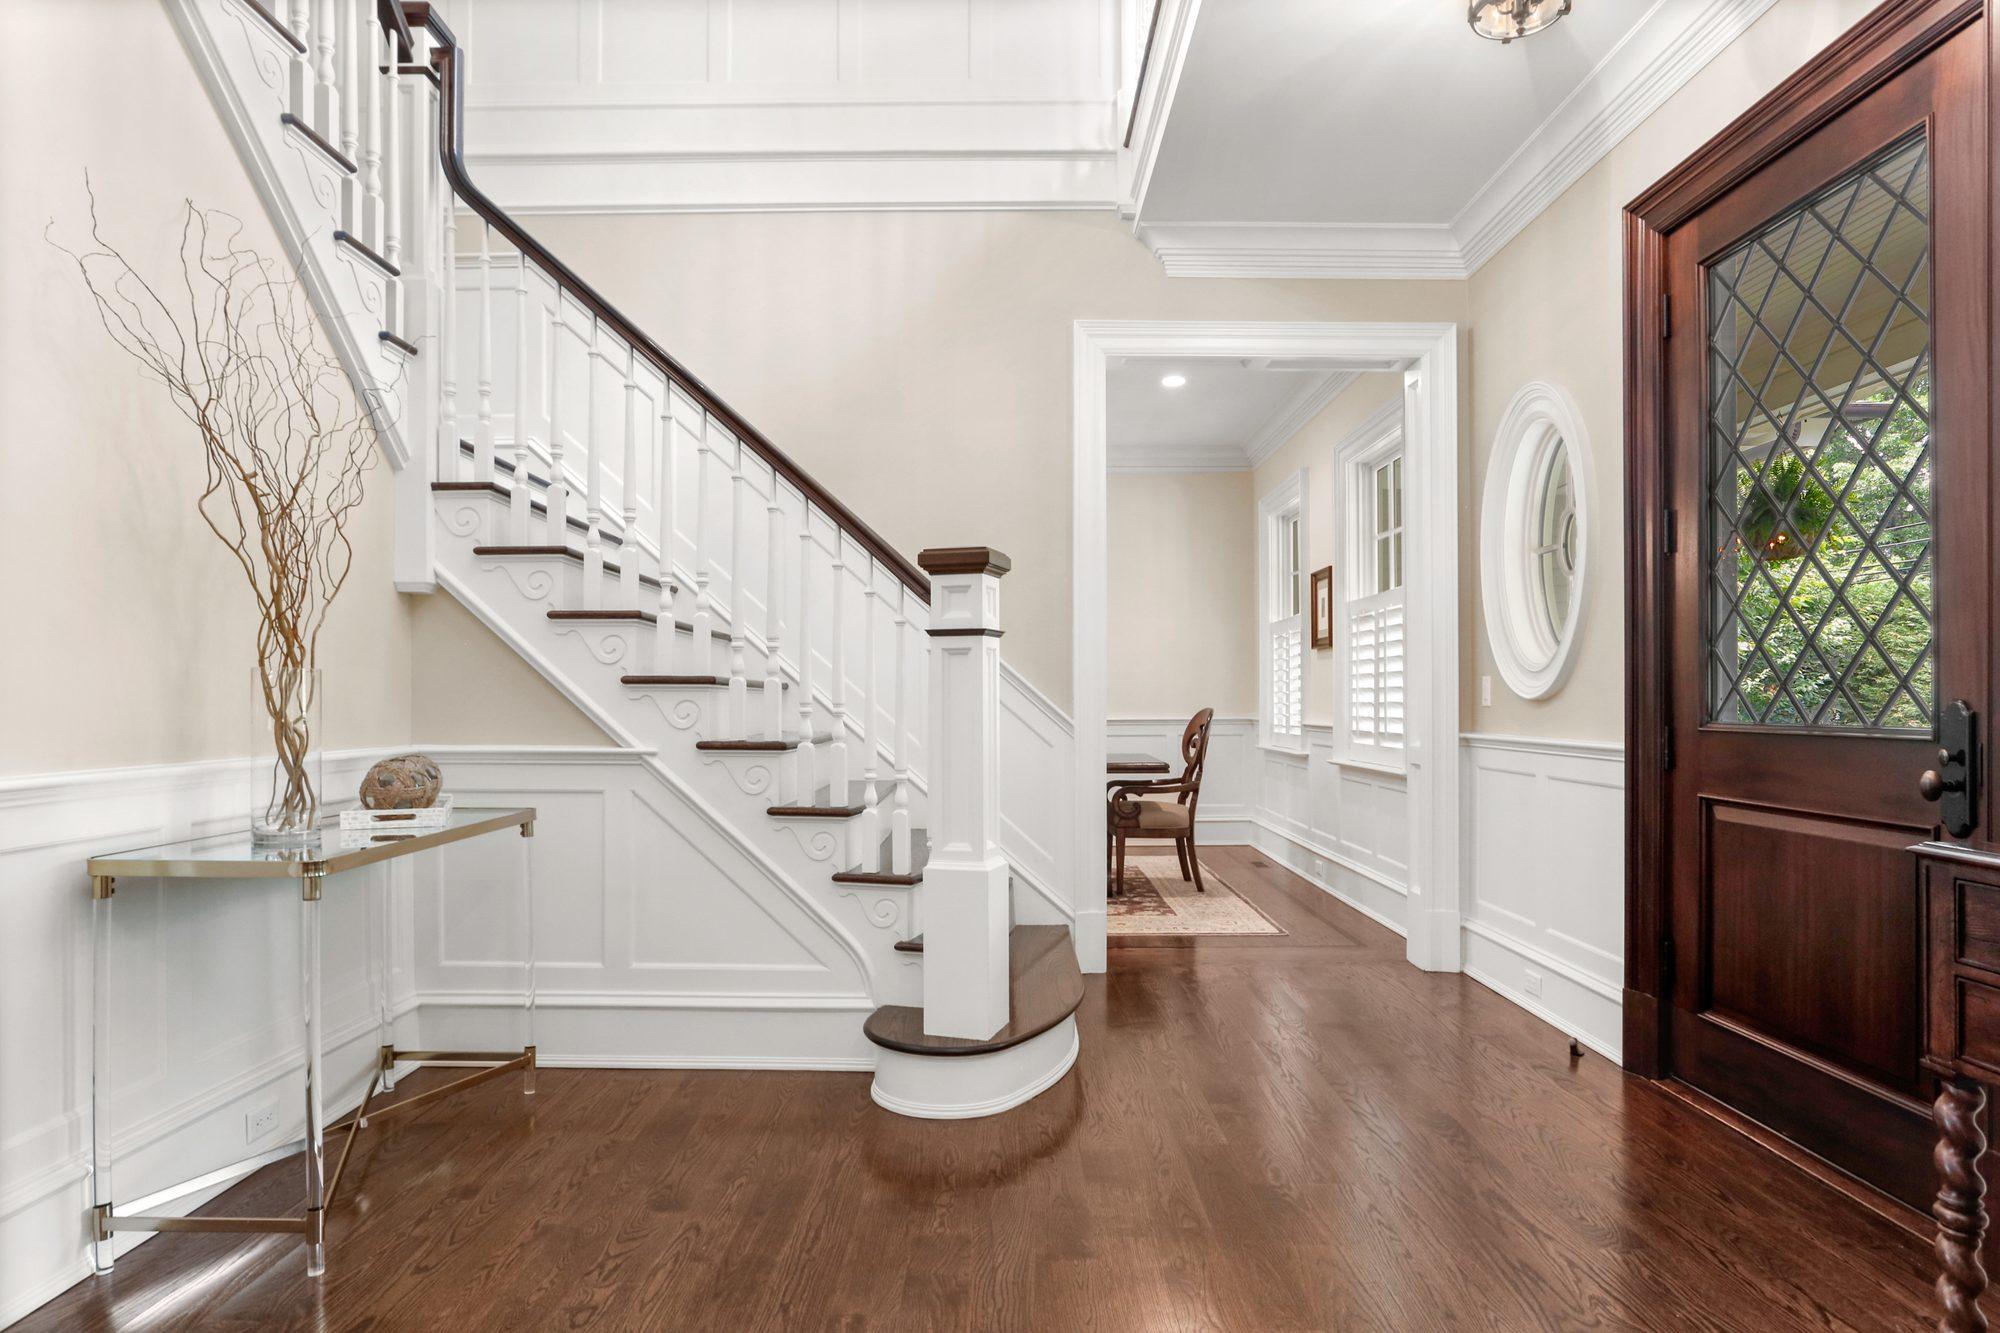 Foyer with medium brown hardwood floors and an eggshell finish.